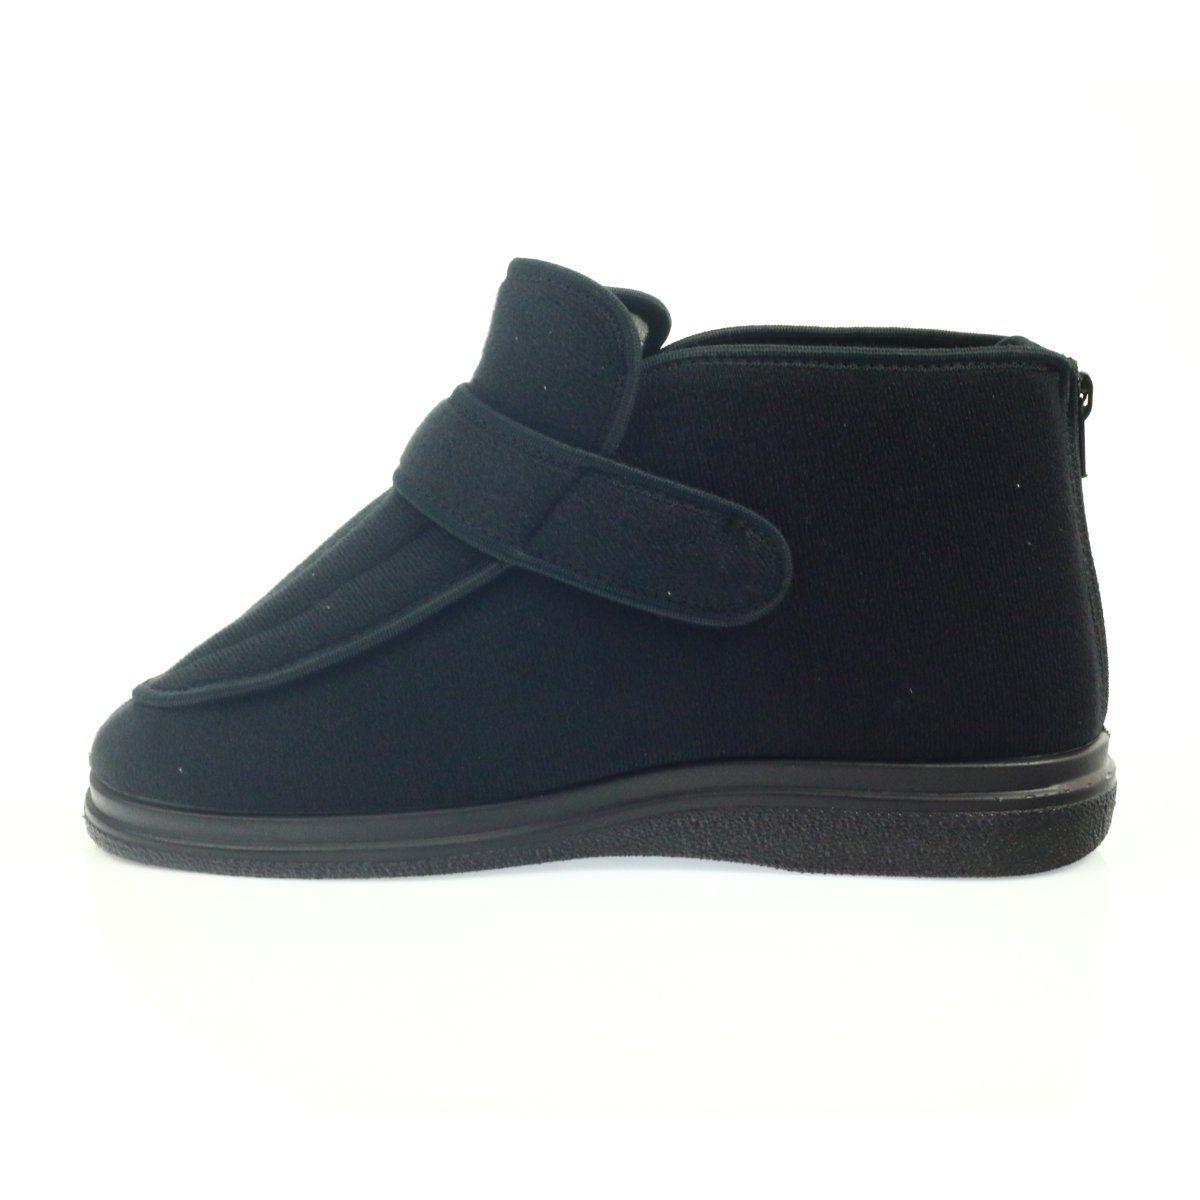 Befado Shoes Dr Orto 987d002 Black Women Shoes Shoes Womens Slippers